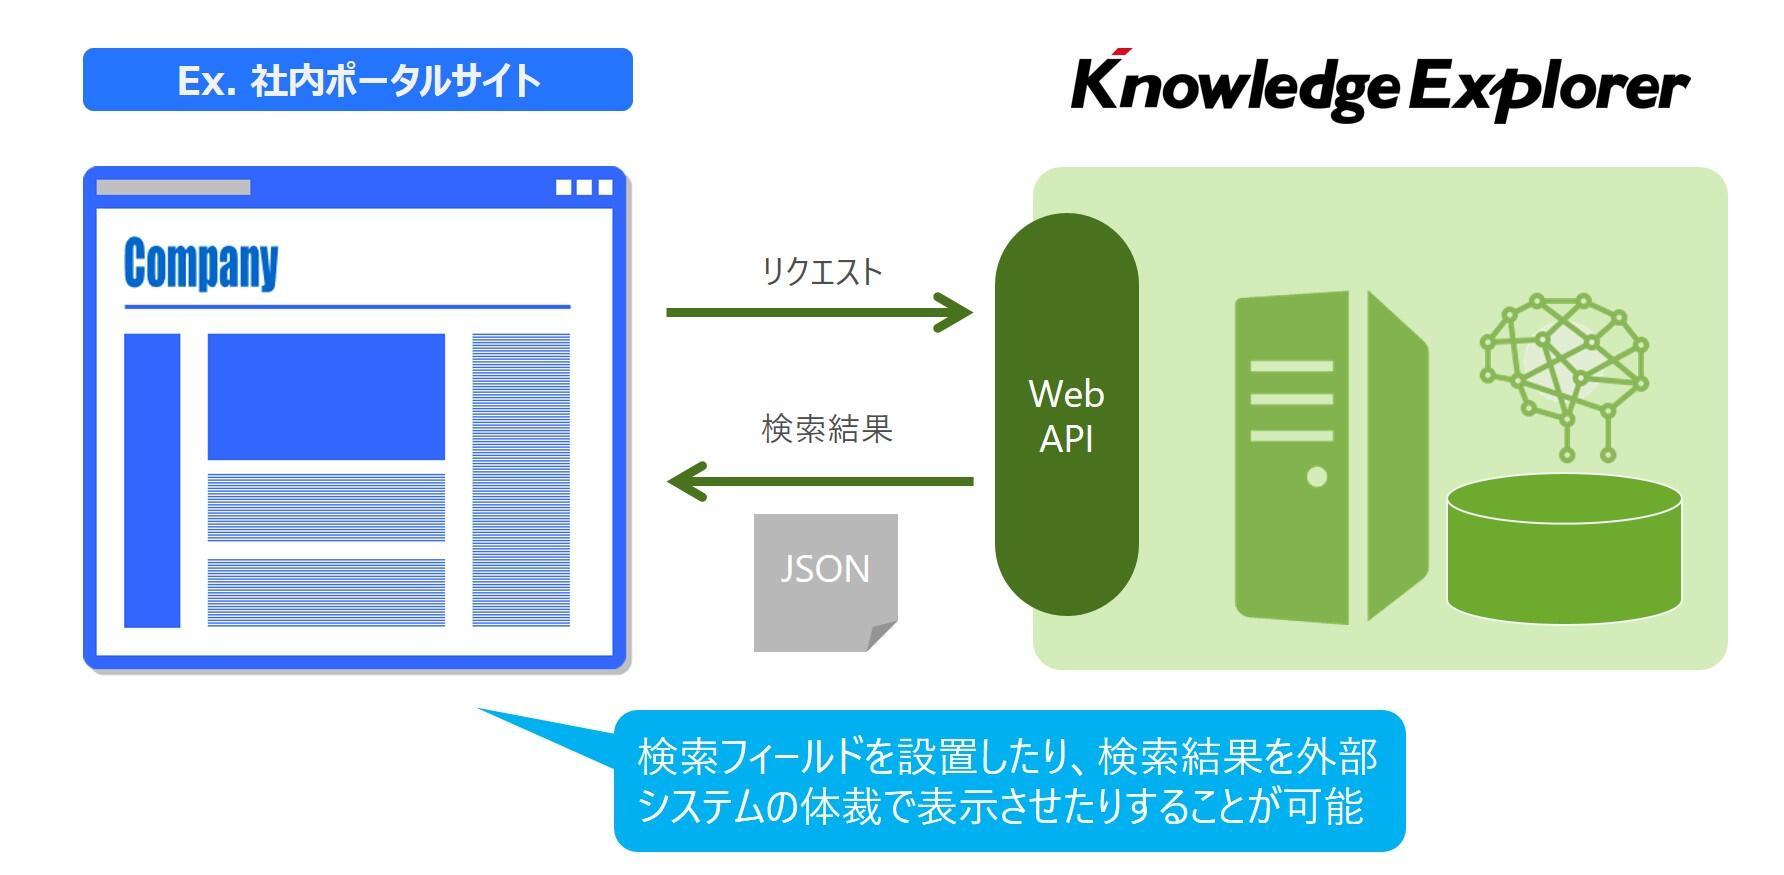 Web API による外部システム連携イメージ